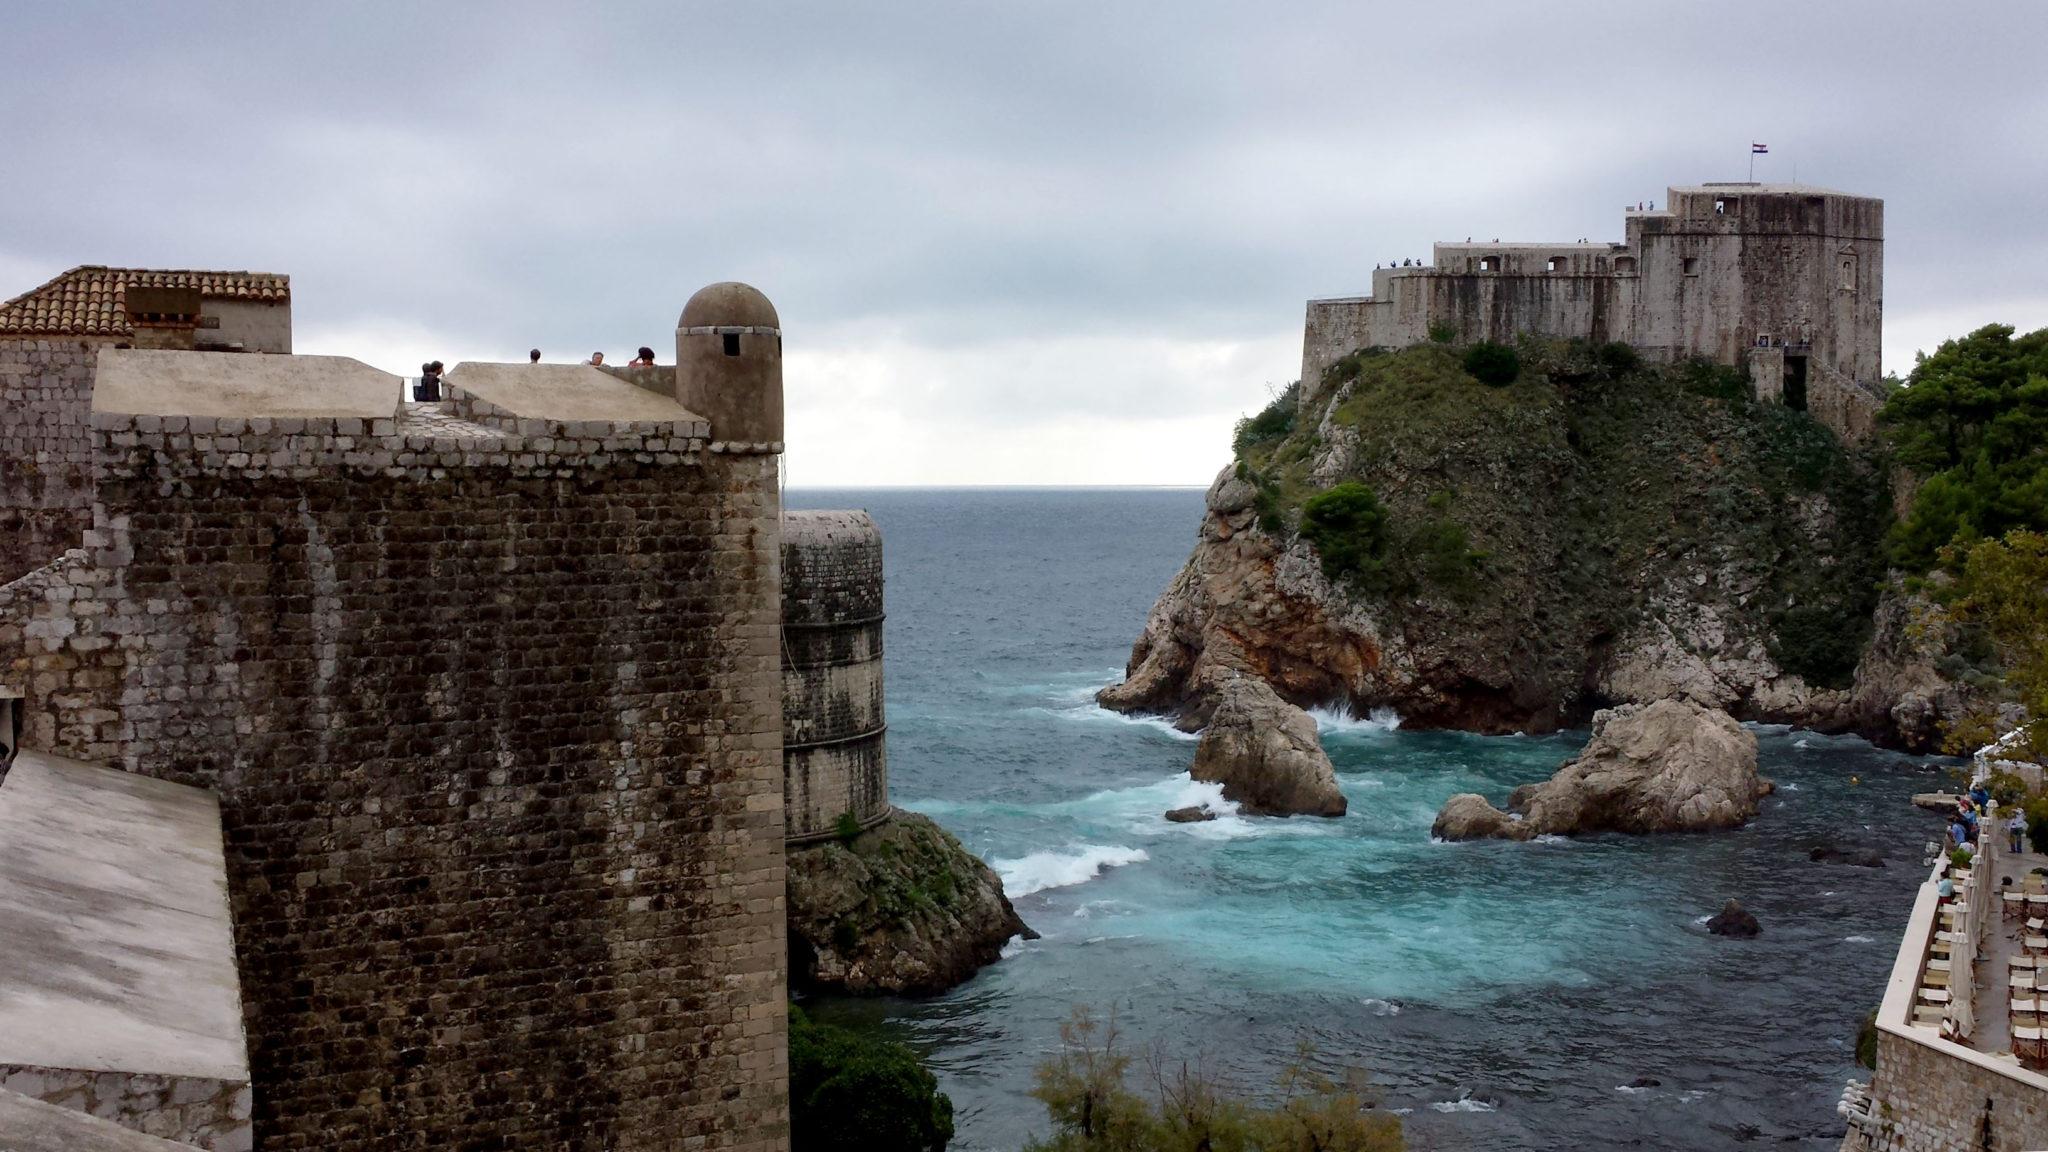 Hema_blog_mode_voyage_croatie_une_journee_a_dubrovnik_vue_des_remparts7